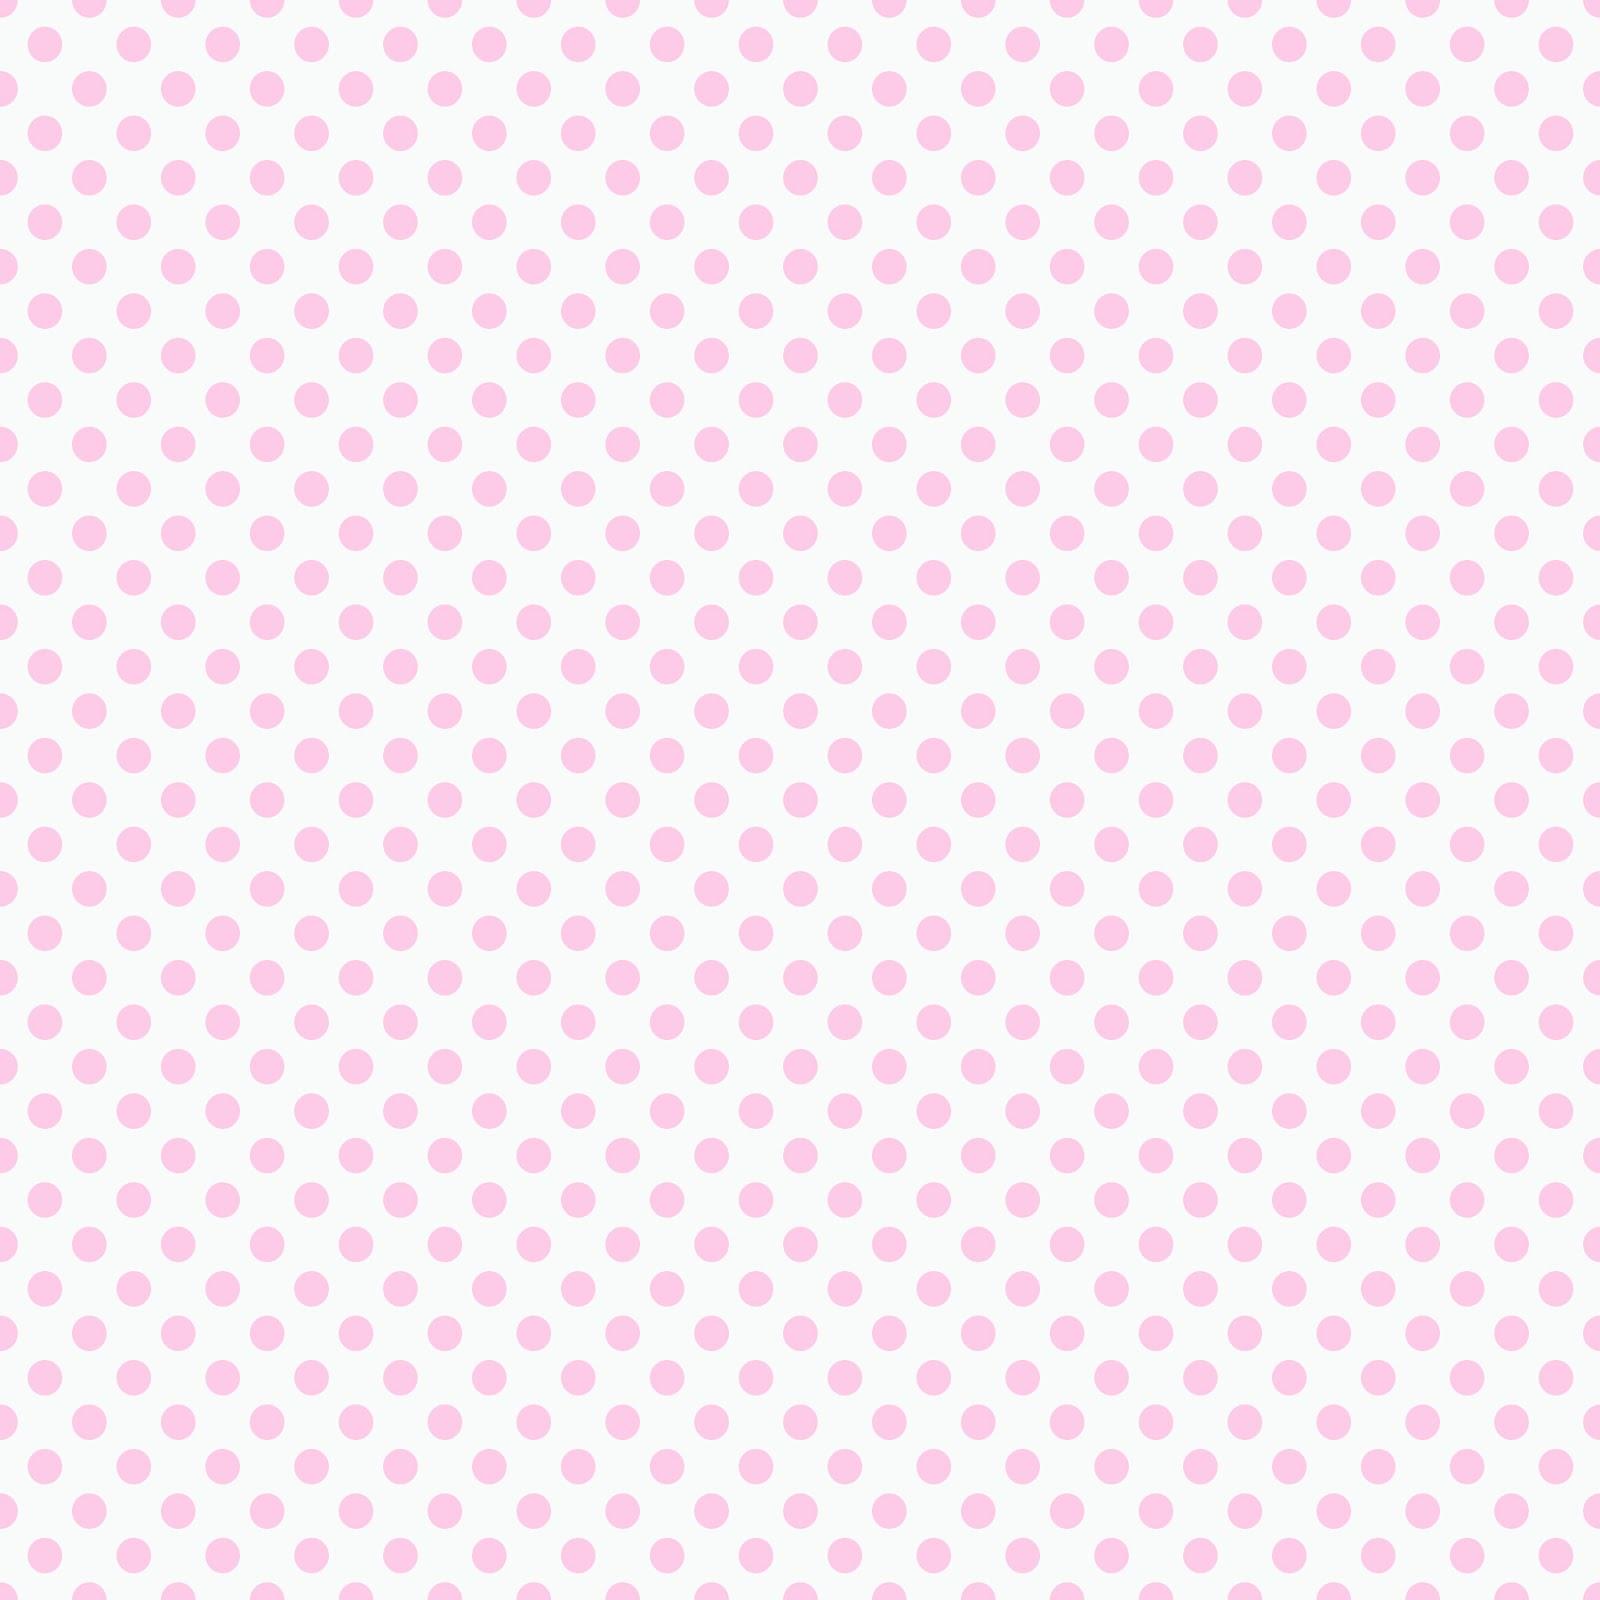 http://2.bp.blogspot.com/-8JAA0GE9abM/T7NBPF9U37I/AAAAAAAAFBM/MqpehYjBJsw/s1600/free%2Bdigital%2Bscrapbook%2Bpaper_pink%2Bpolka%2Bdots_.jpg